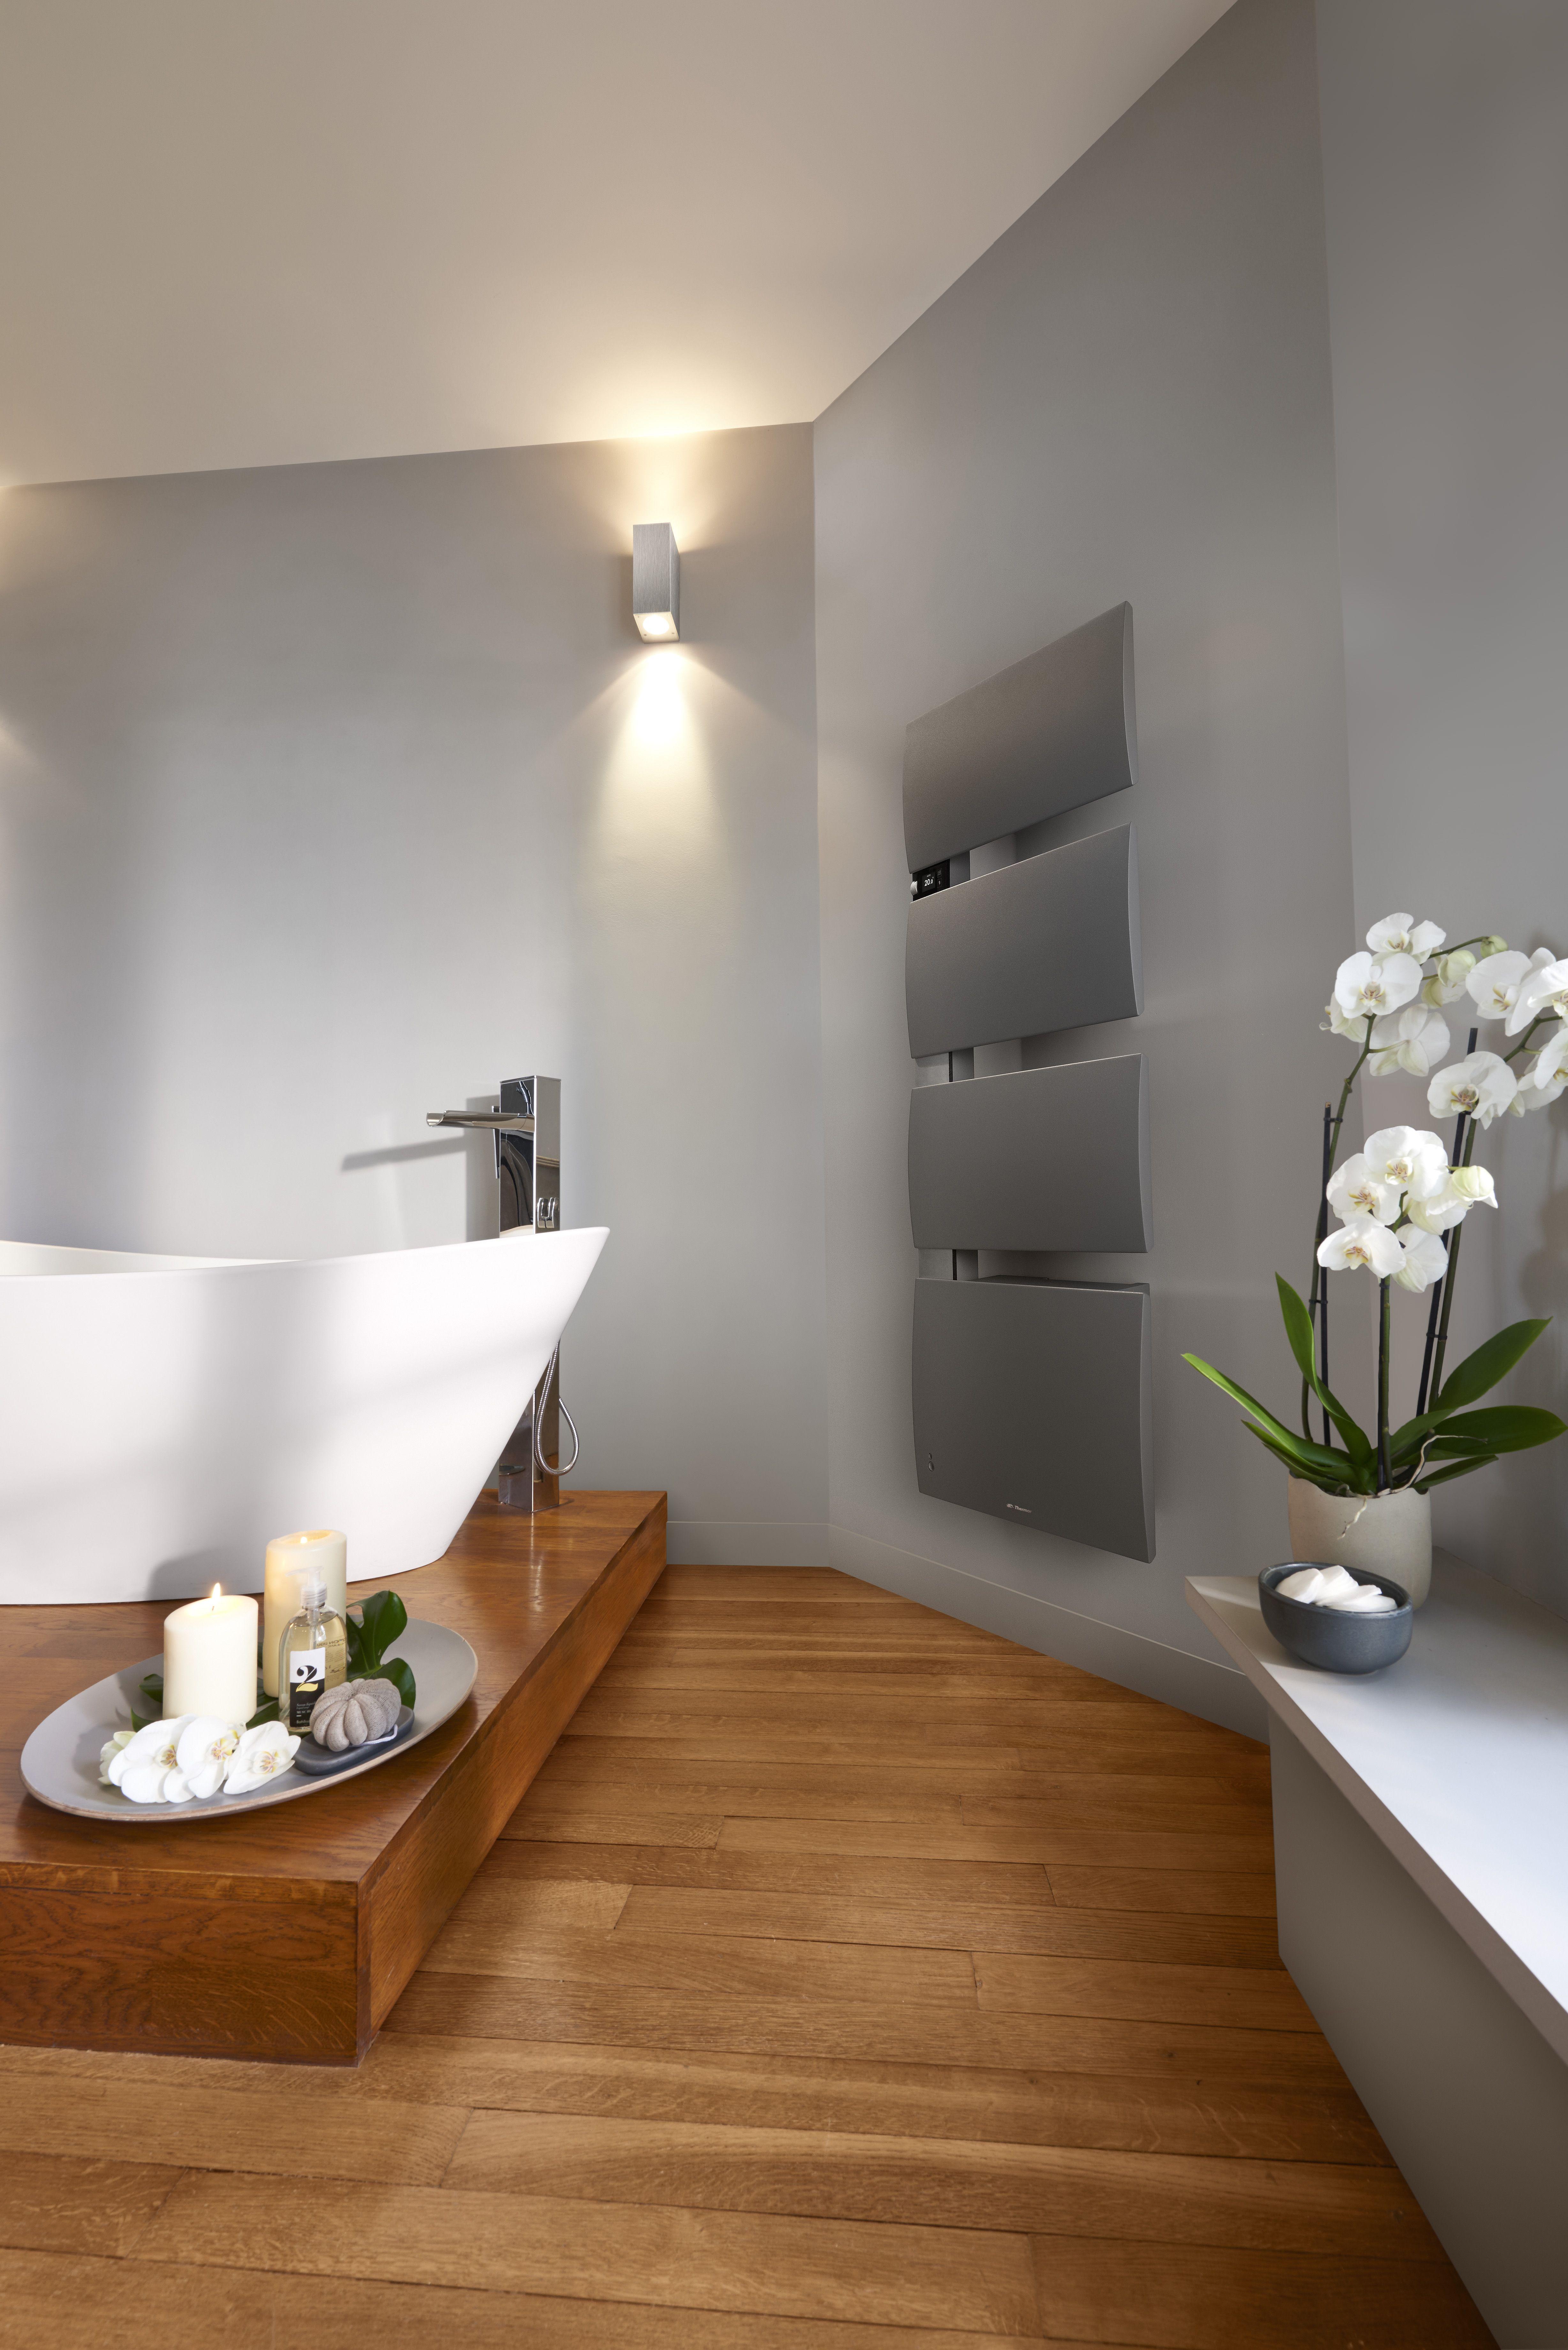 Sèche-serviettes design Gris Roche finition alu brossé ... on interior kitchens, house beautiful bathrooms, top designer bathrooms, interior decorating, philippe starck bathrooms,